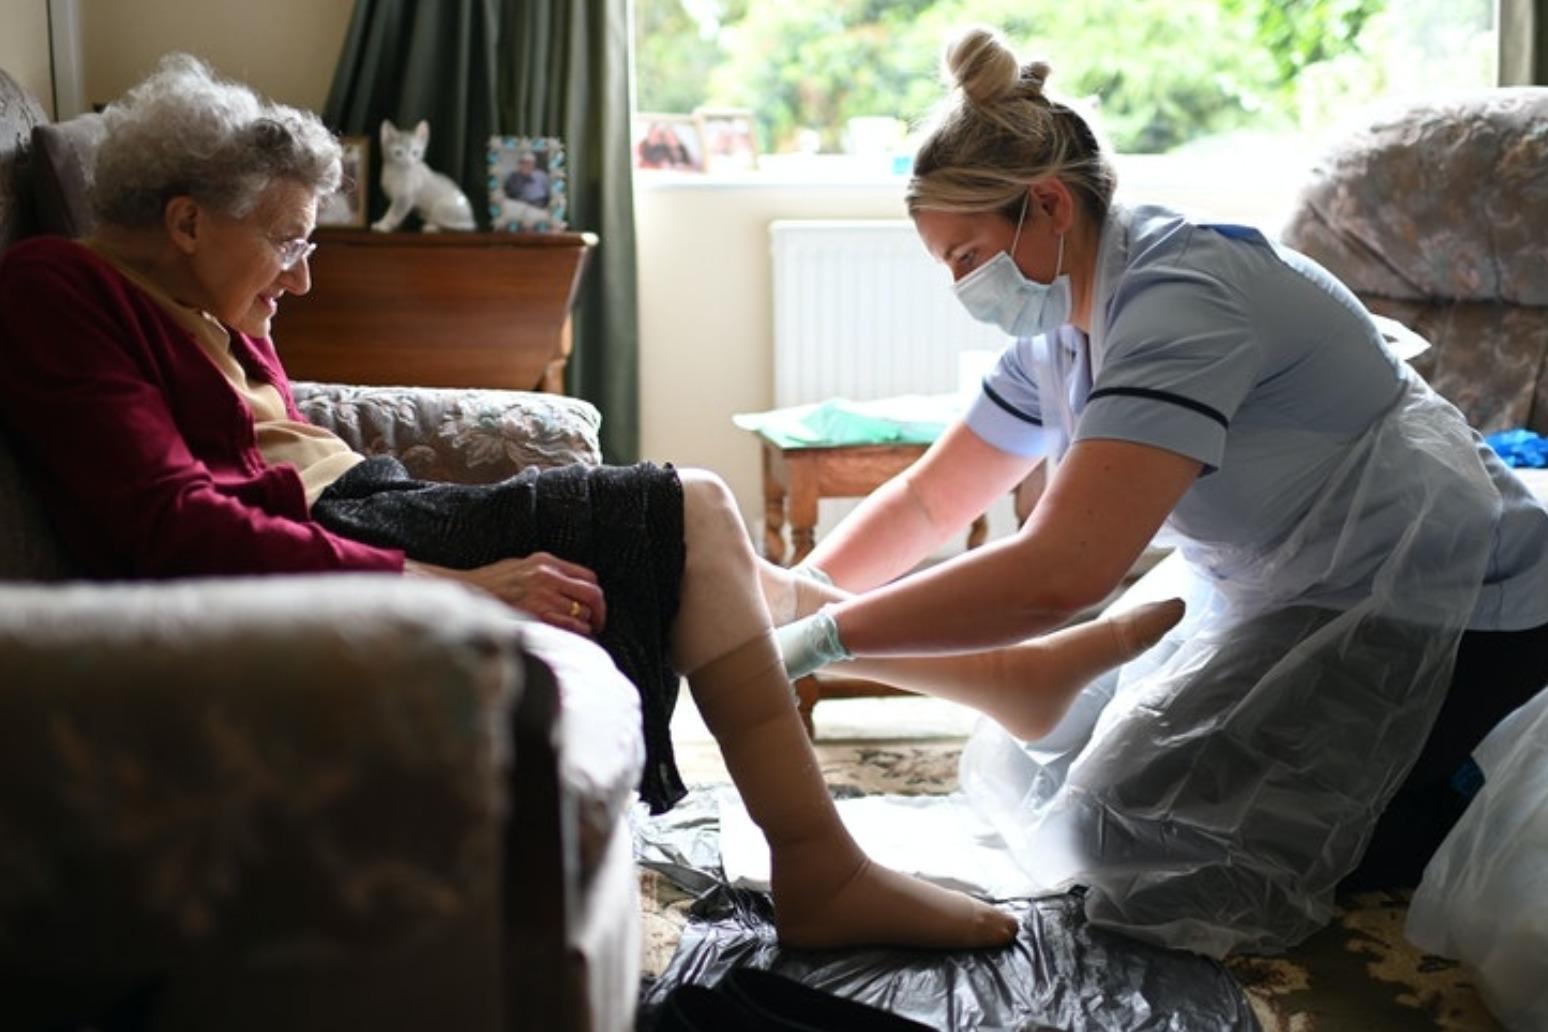 Care home testing target missed despite recent surge, figures suggest